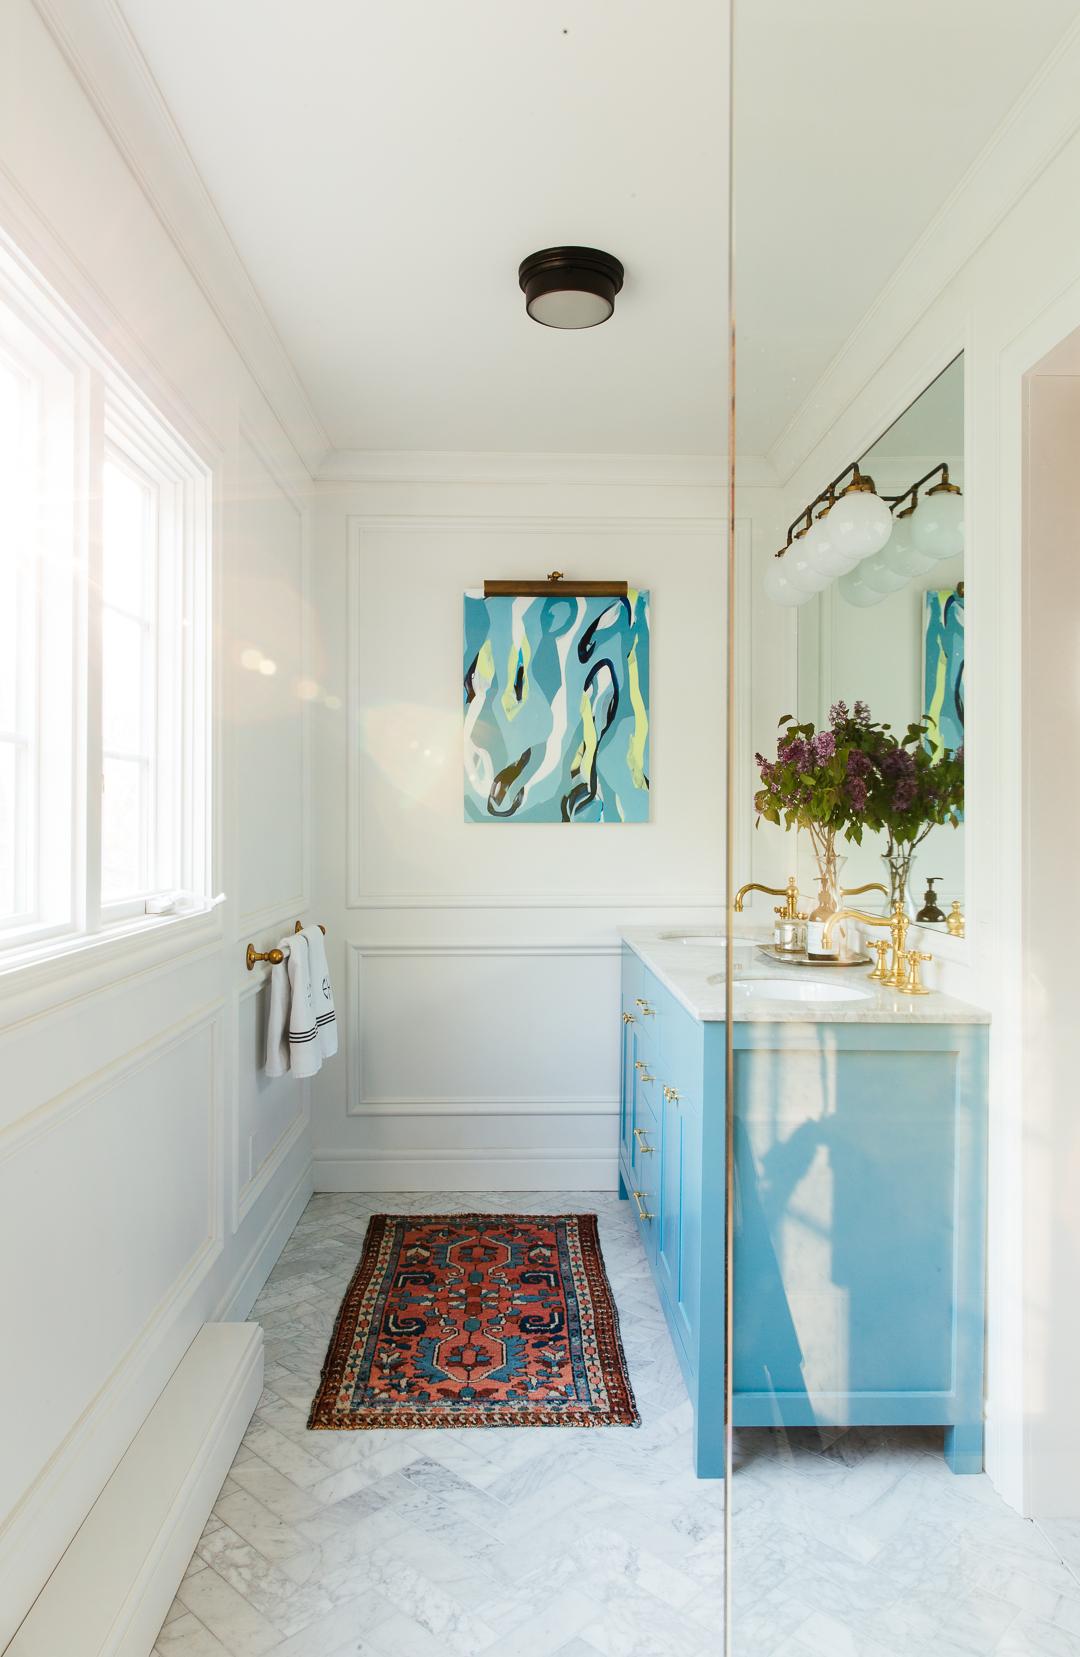 One Room Challenge, Master Bathroom, The Reveal! – Erin Kestenbaum